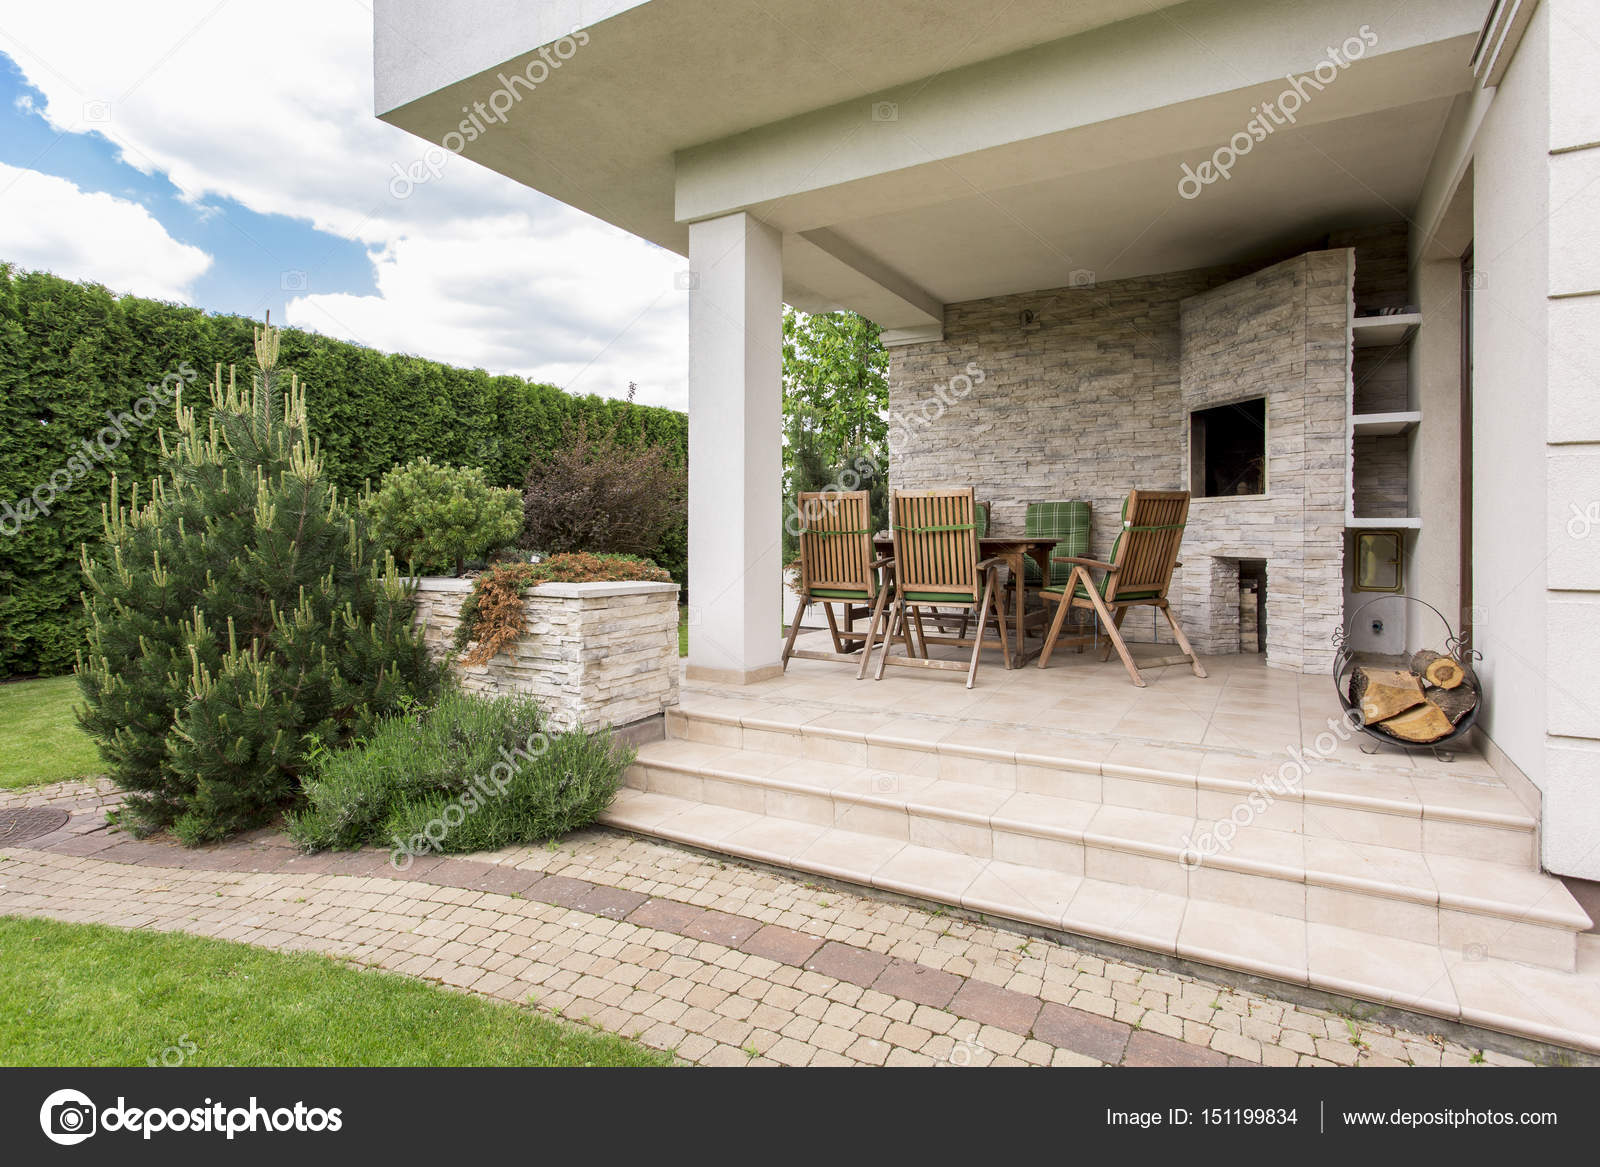 Casa con terrazza — Foto Stock © photographee.eu #151199834